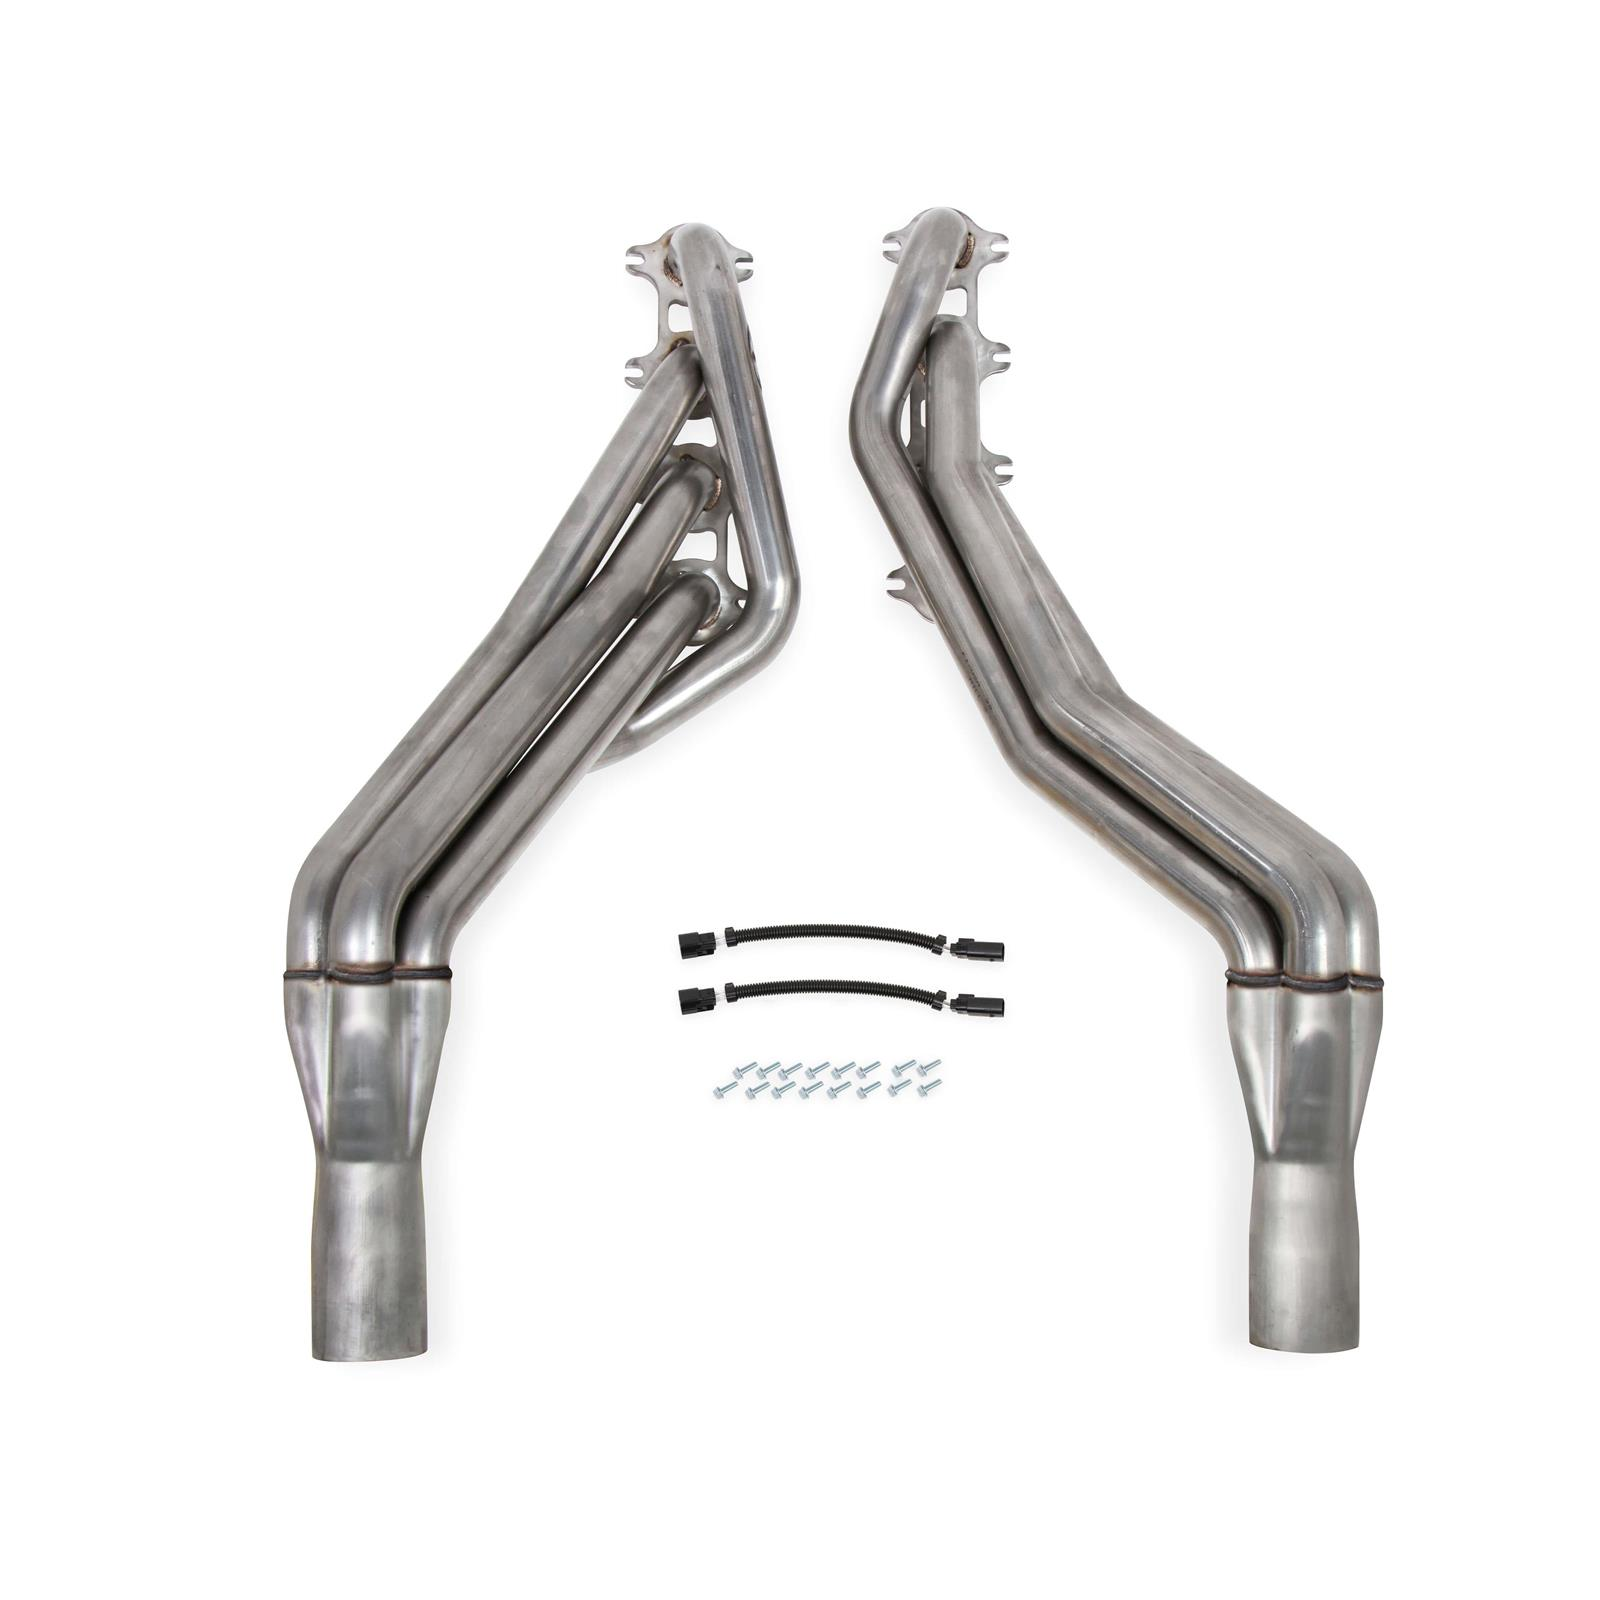 STAINLESS LONG TUBE HEADER FOR 05-10 MUSTANG GT 4.6L V8 MODULAR EXHAUST//MANIFOLD